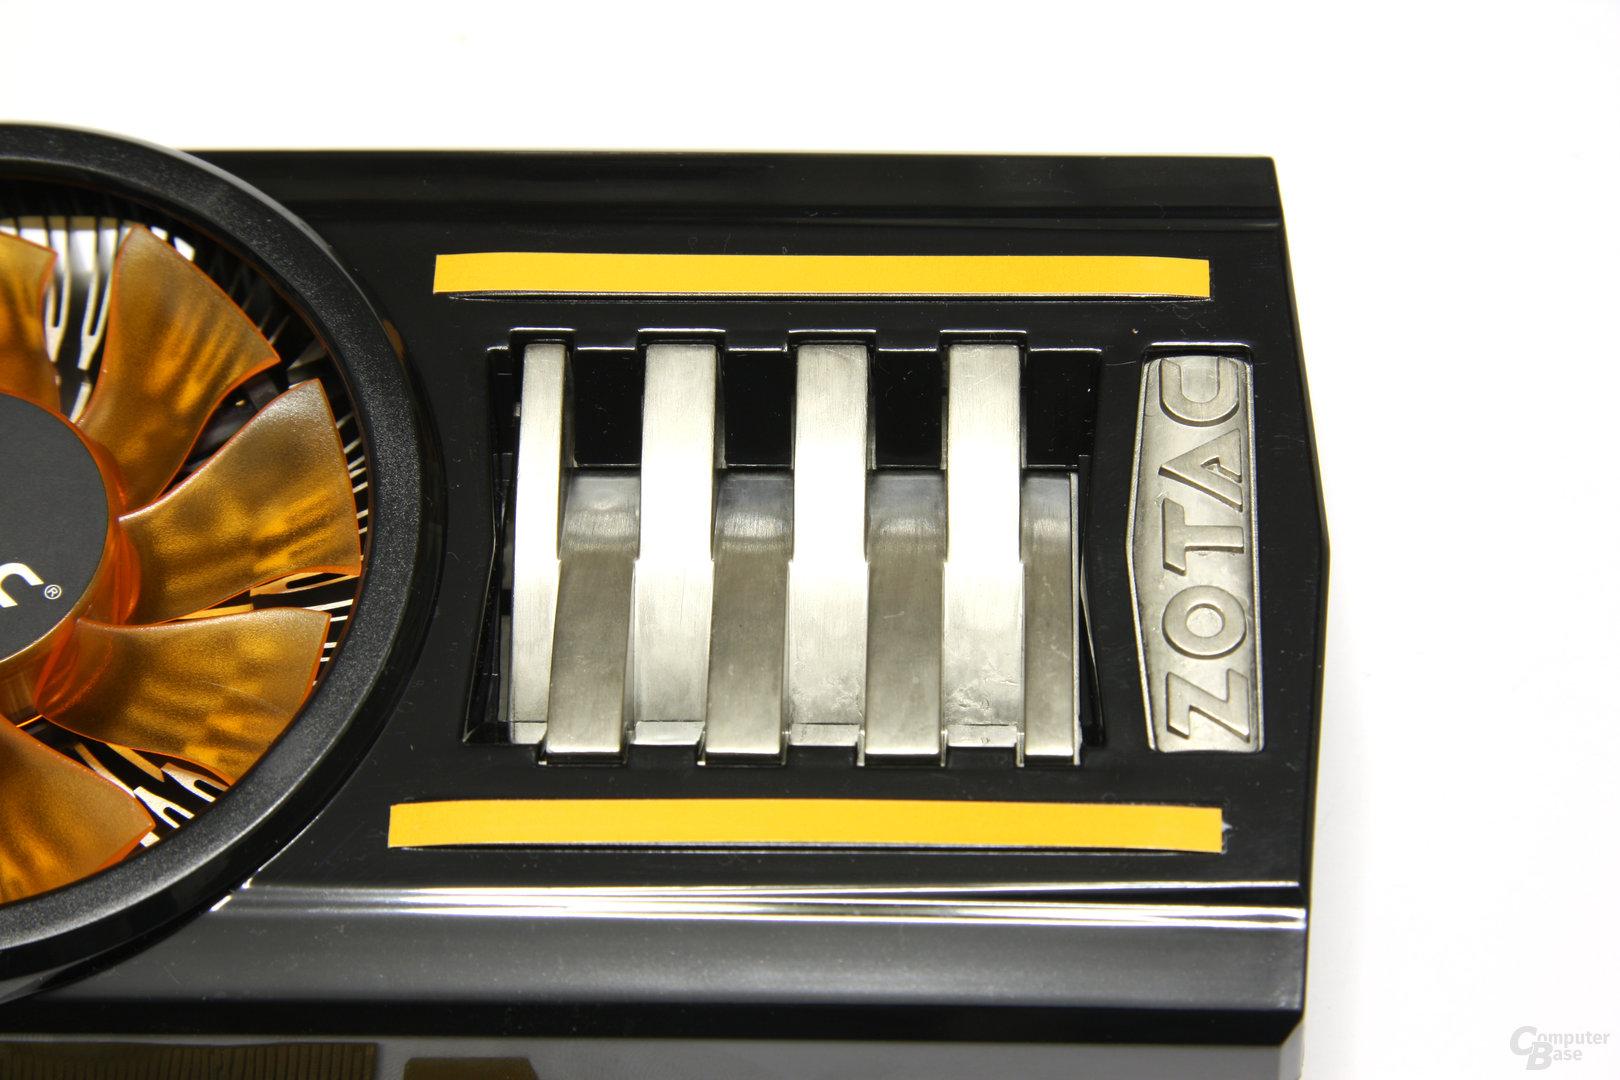 GeForce GTX 460 AMP! Schriftzug